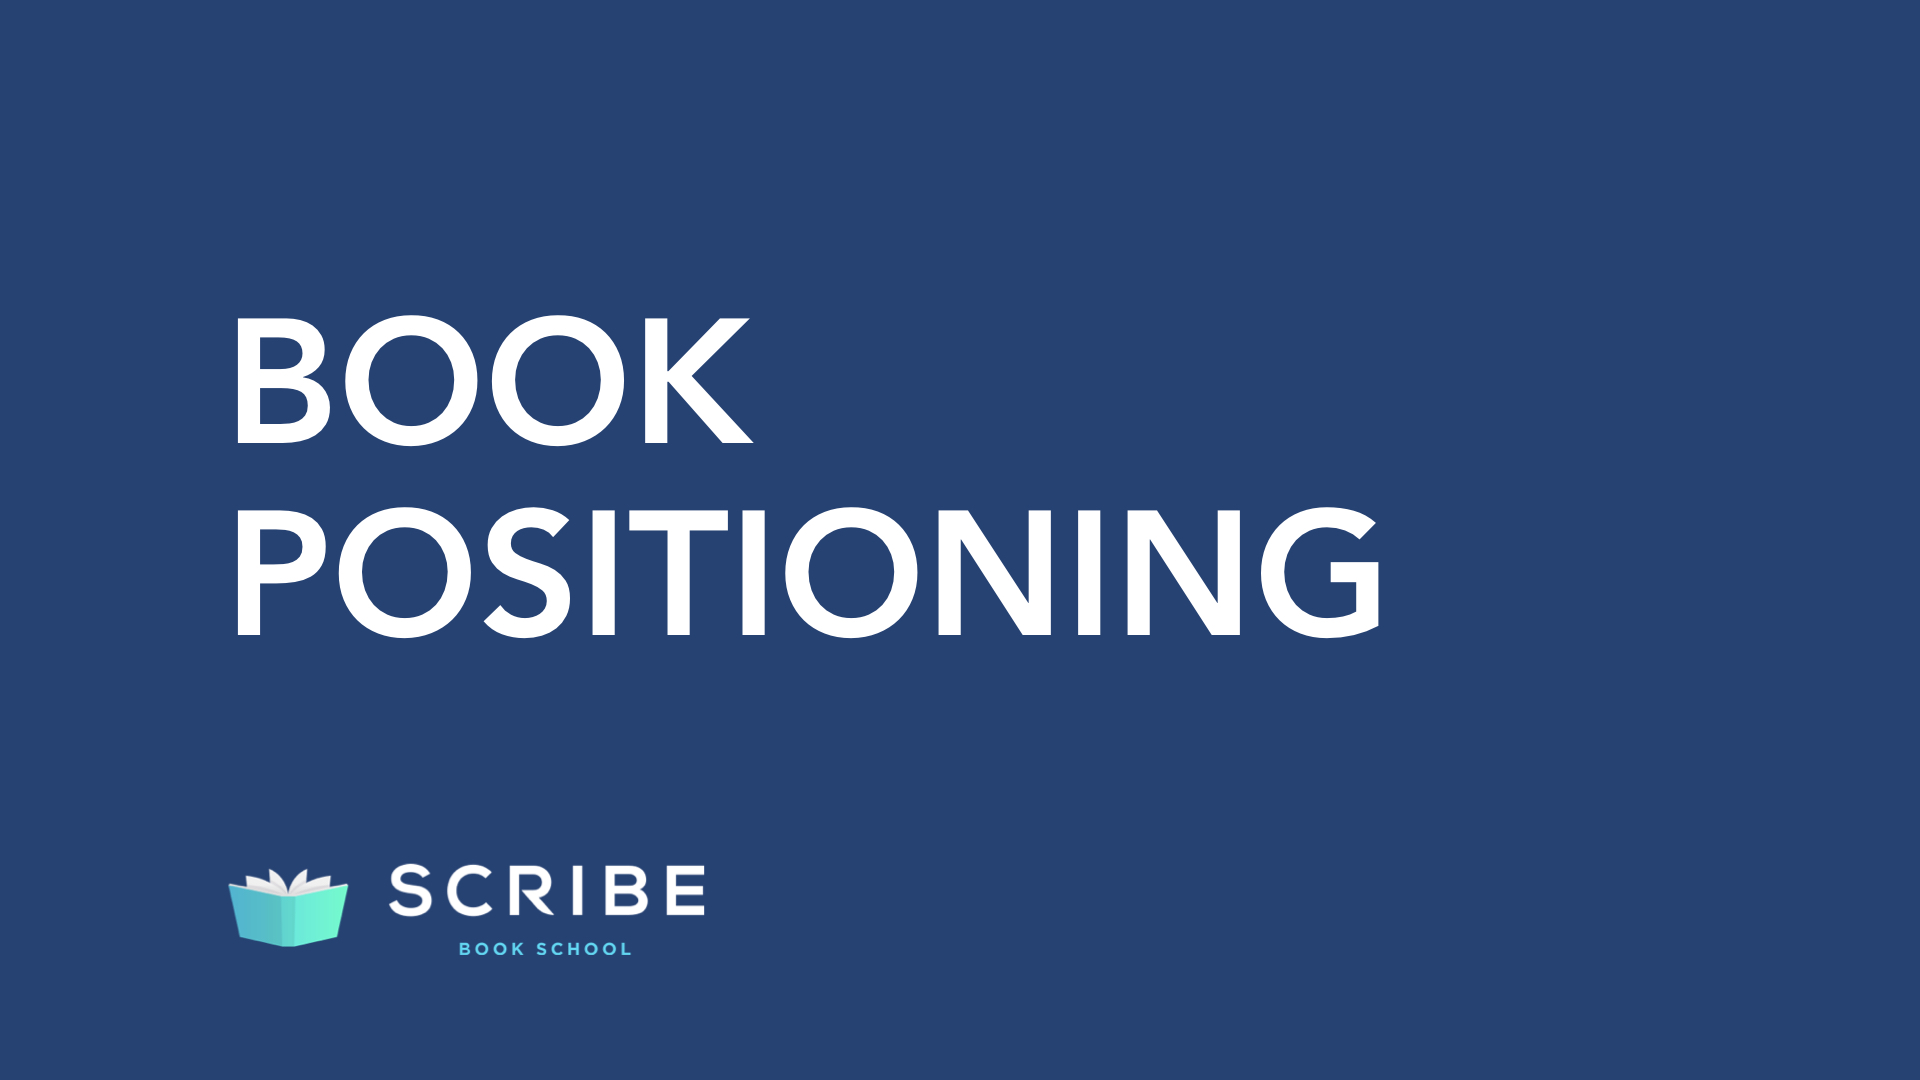 scribe book school positioning